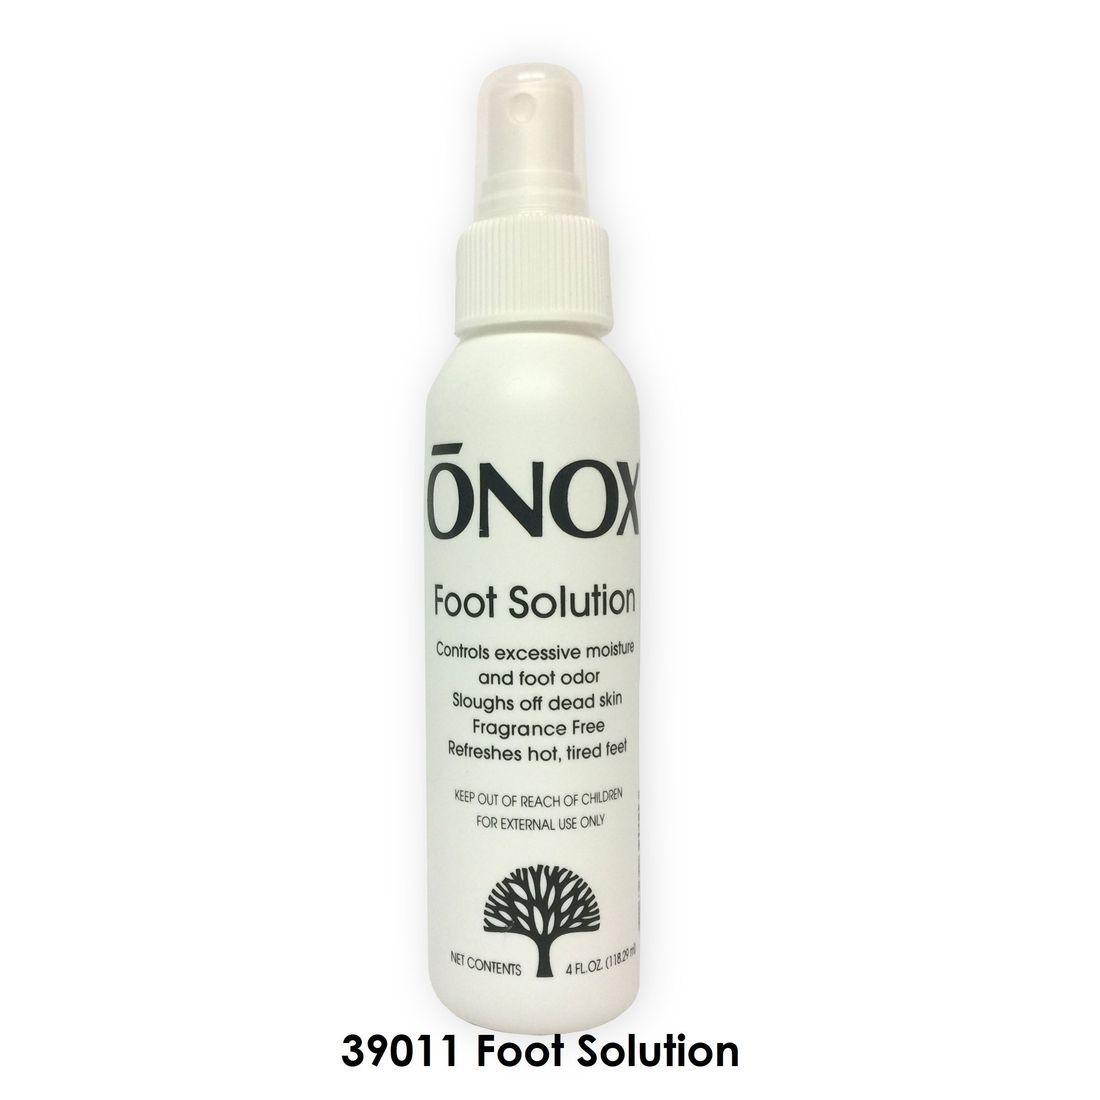 ONOX Foot Solution